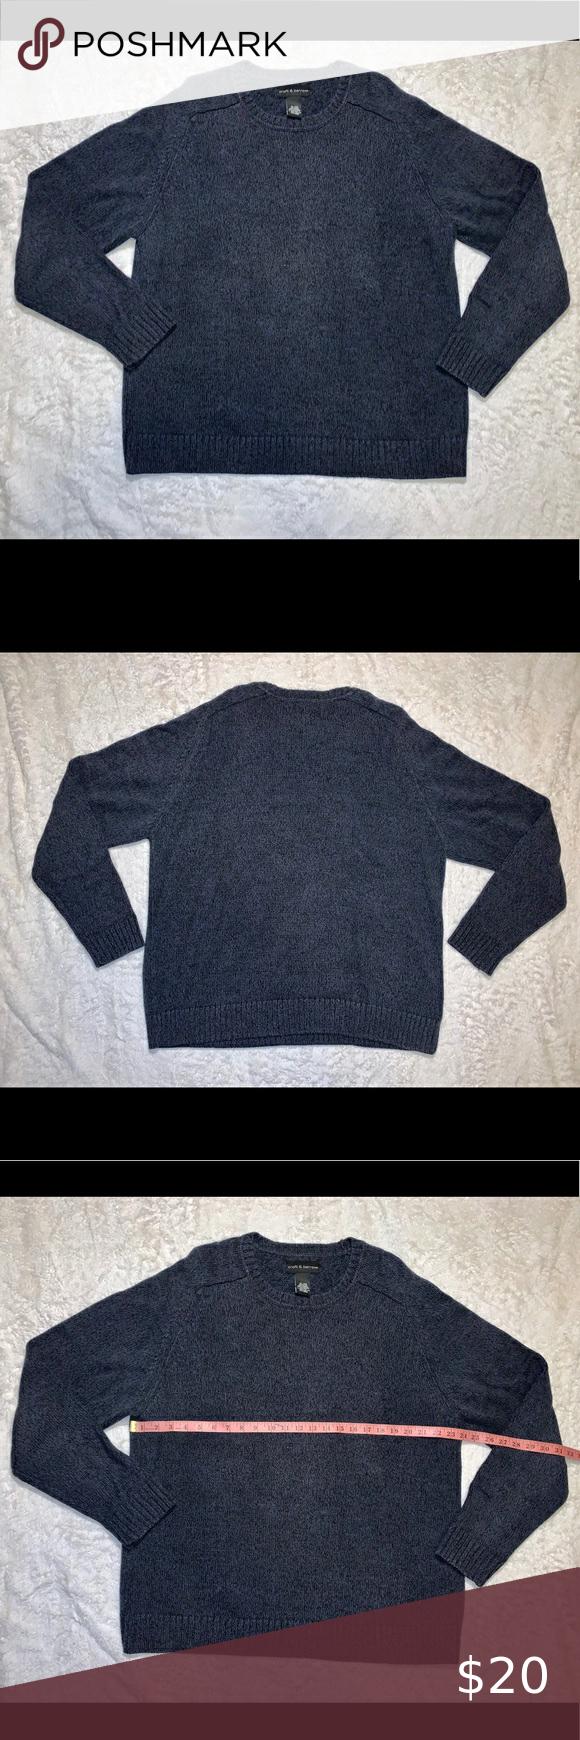 Croft Barrow Crew Neck Sweater Men S Xl Crew Neck Sweater Men Crew Neck Sweater Men Sweater [ 1740 x 580 Pixel ]